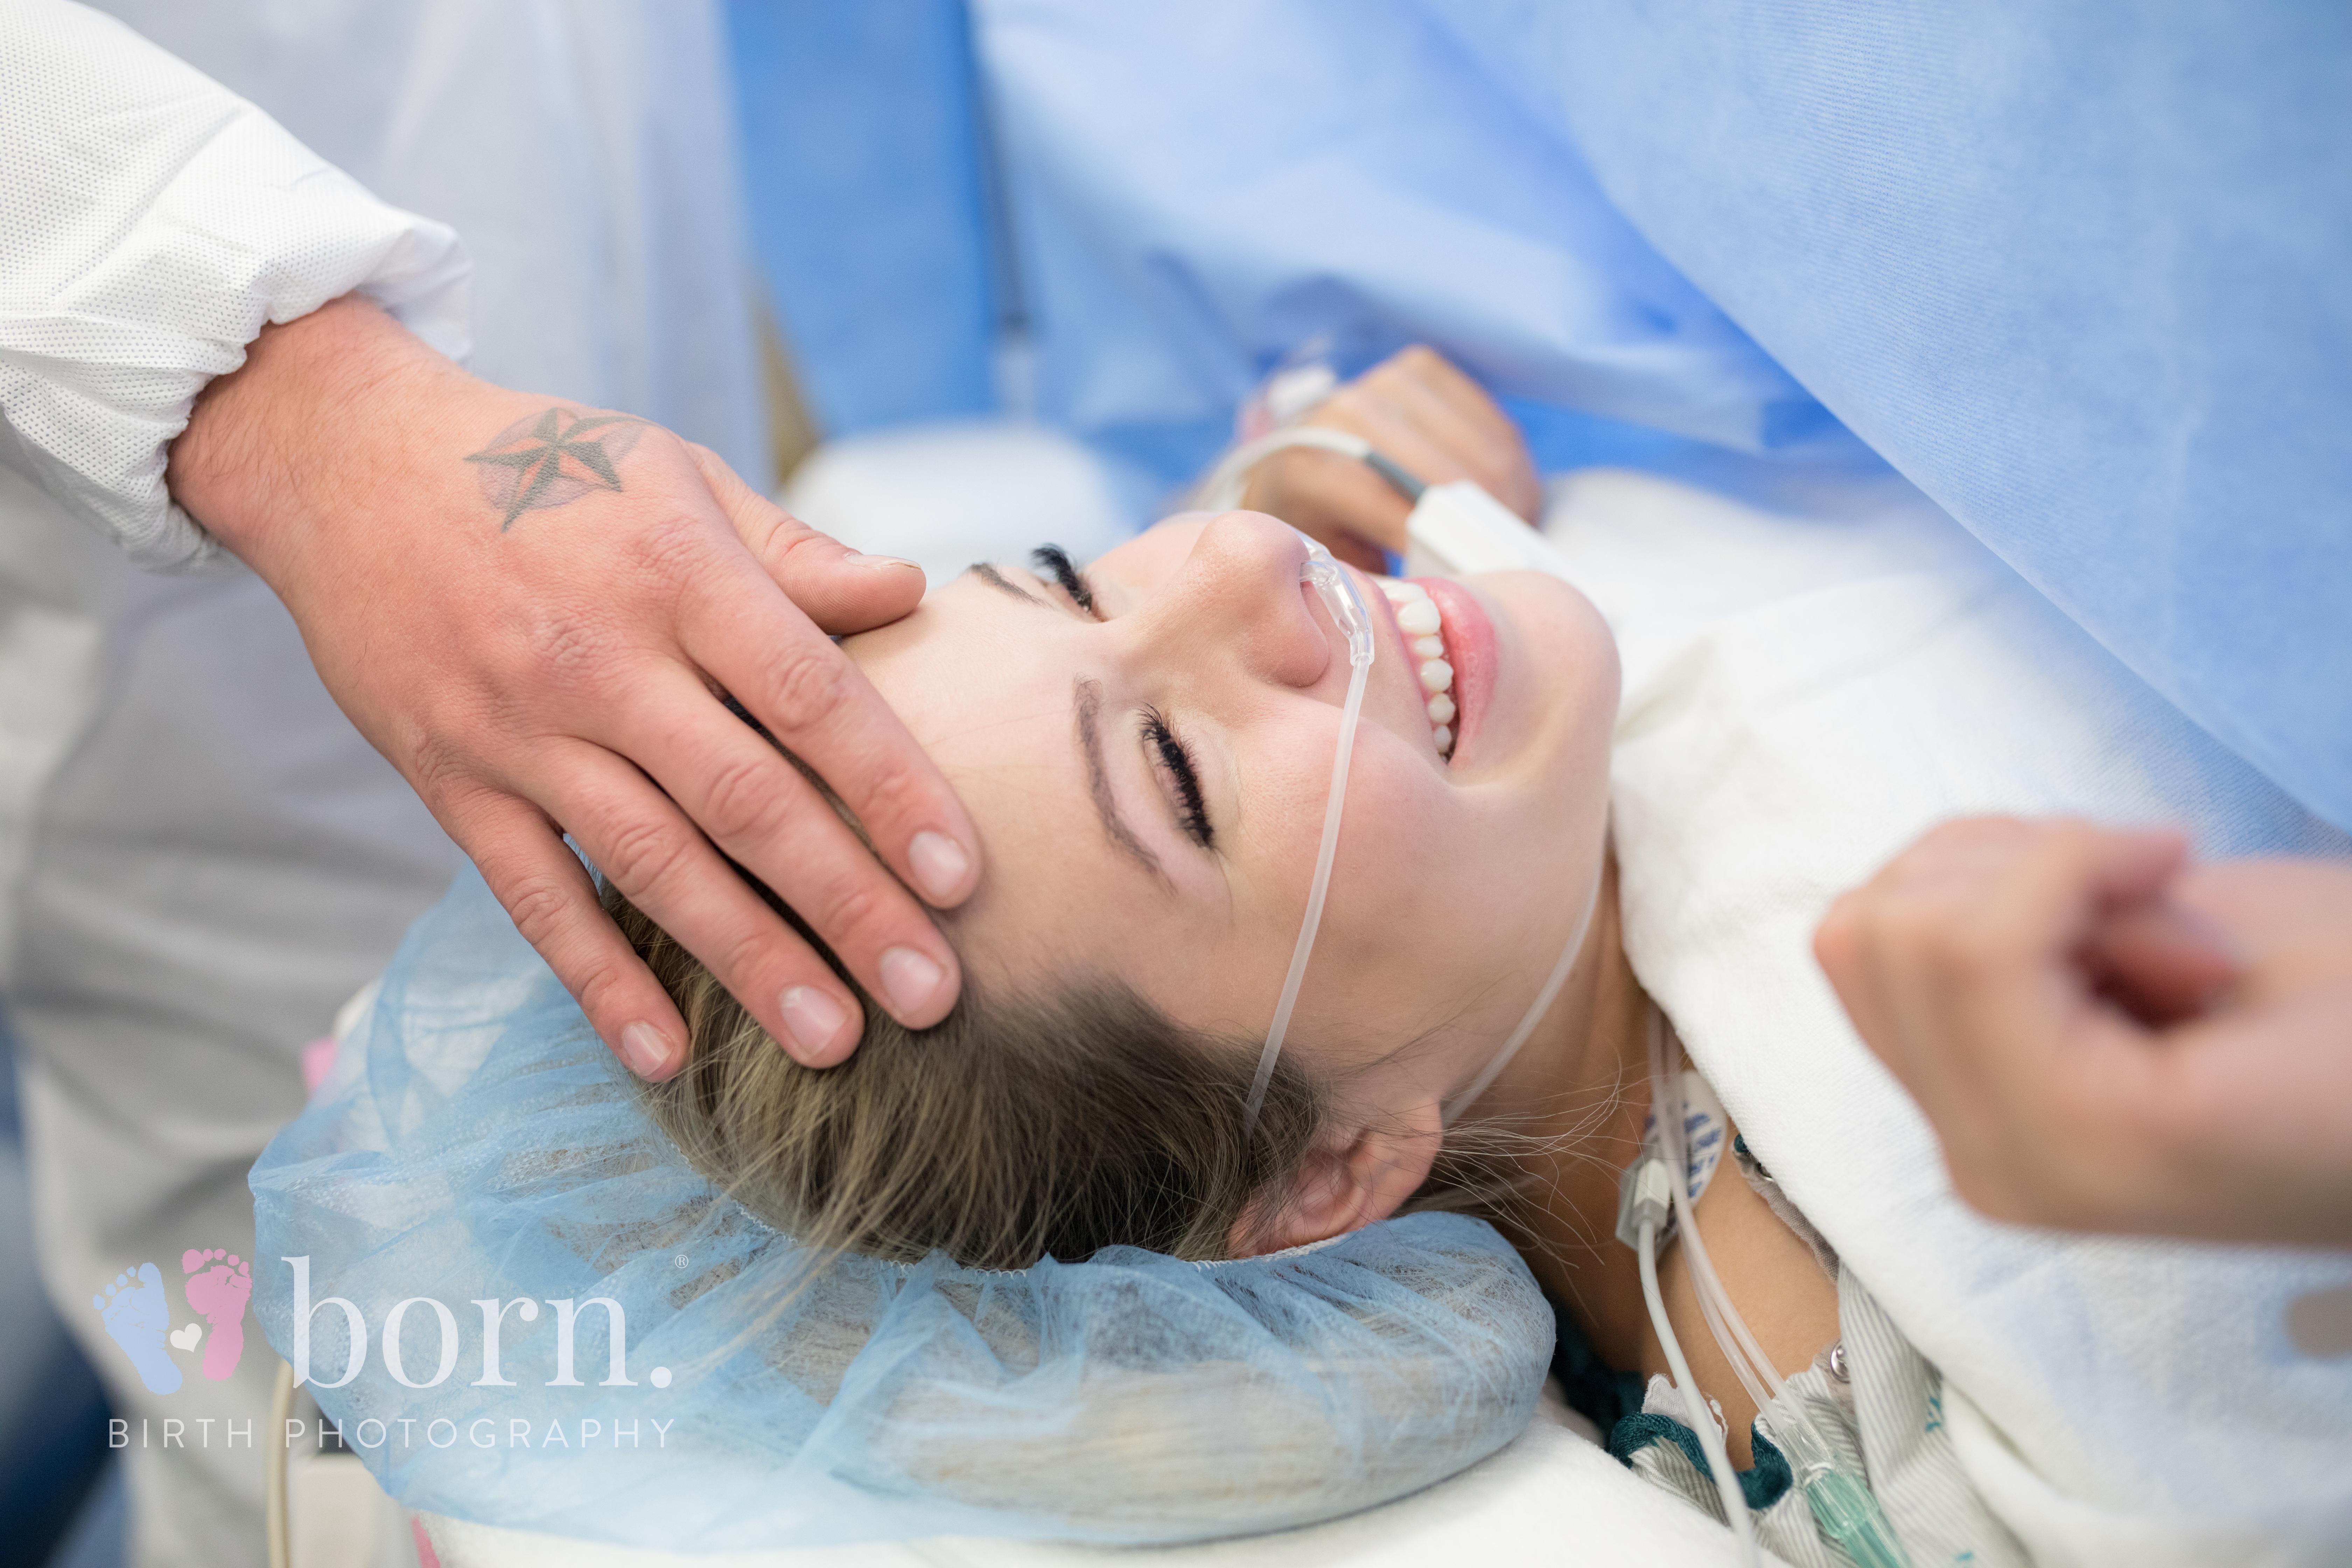 BCesareanbirthphotography